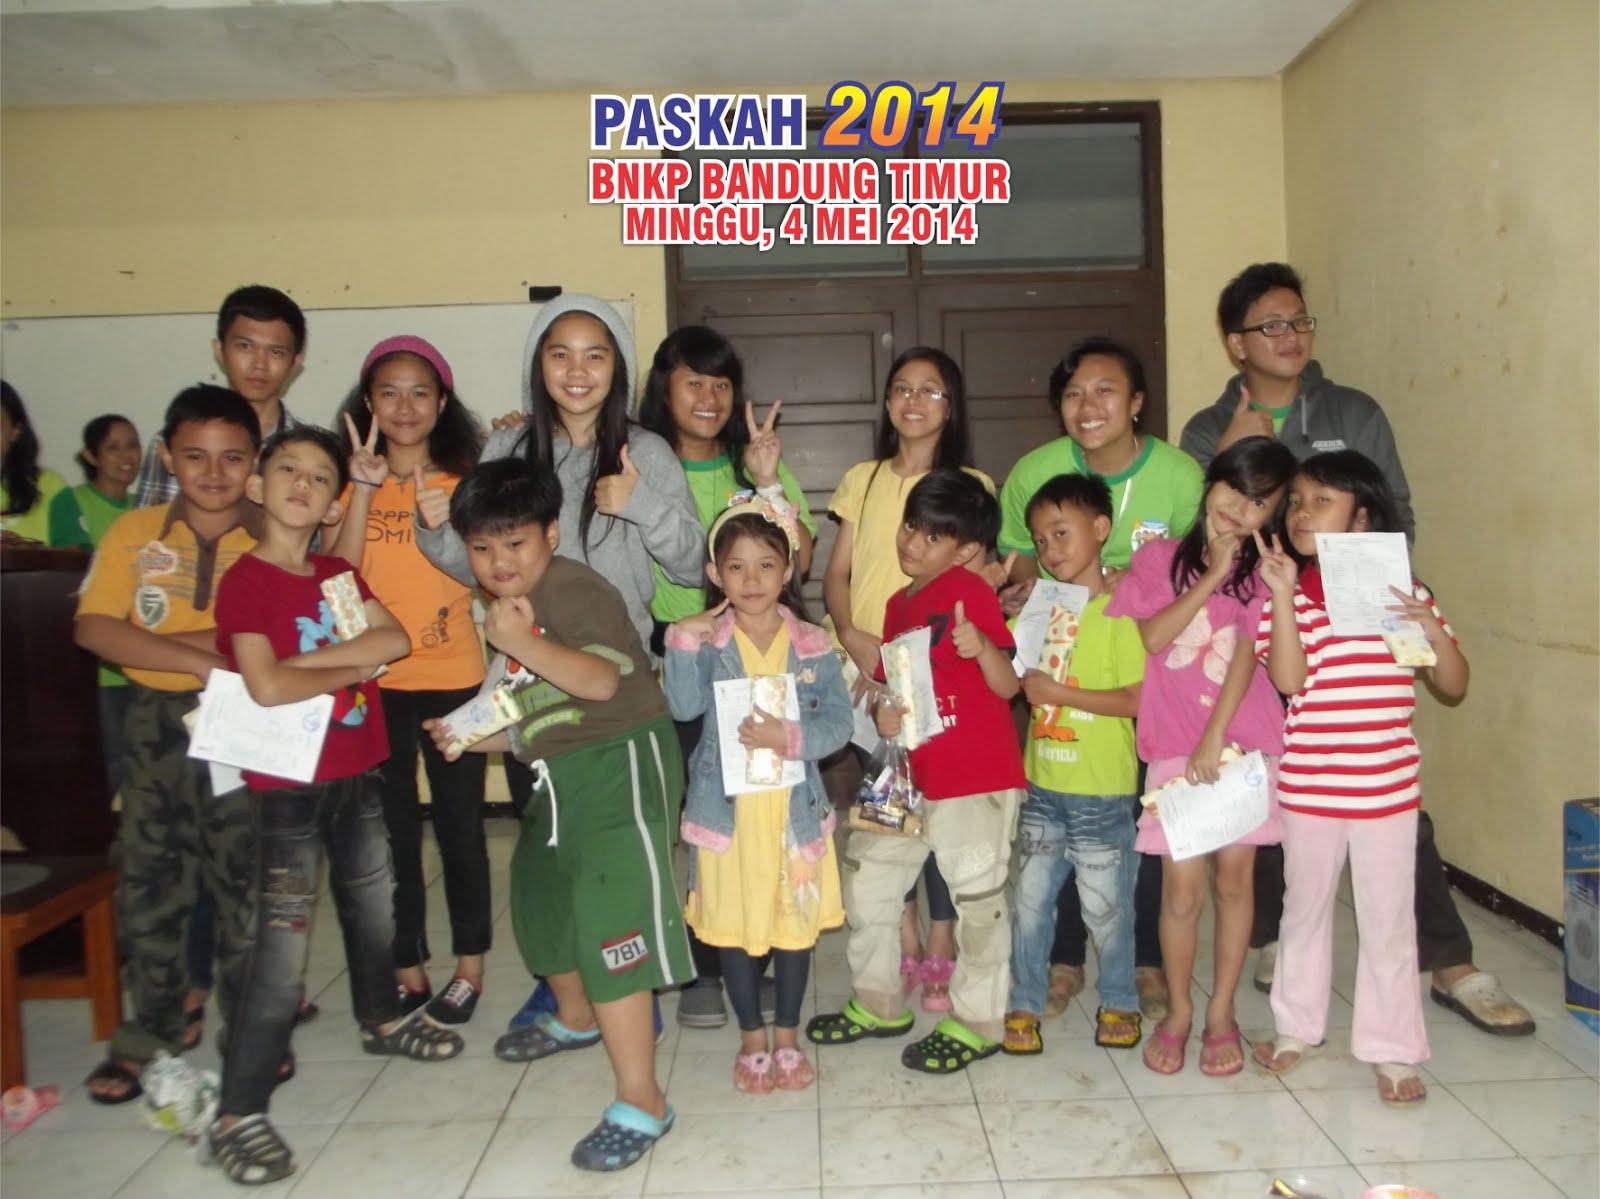 Perayaan Paskah 2014